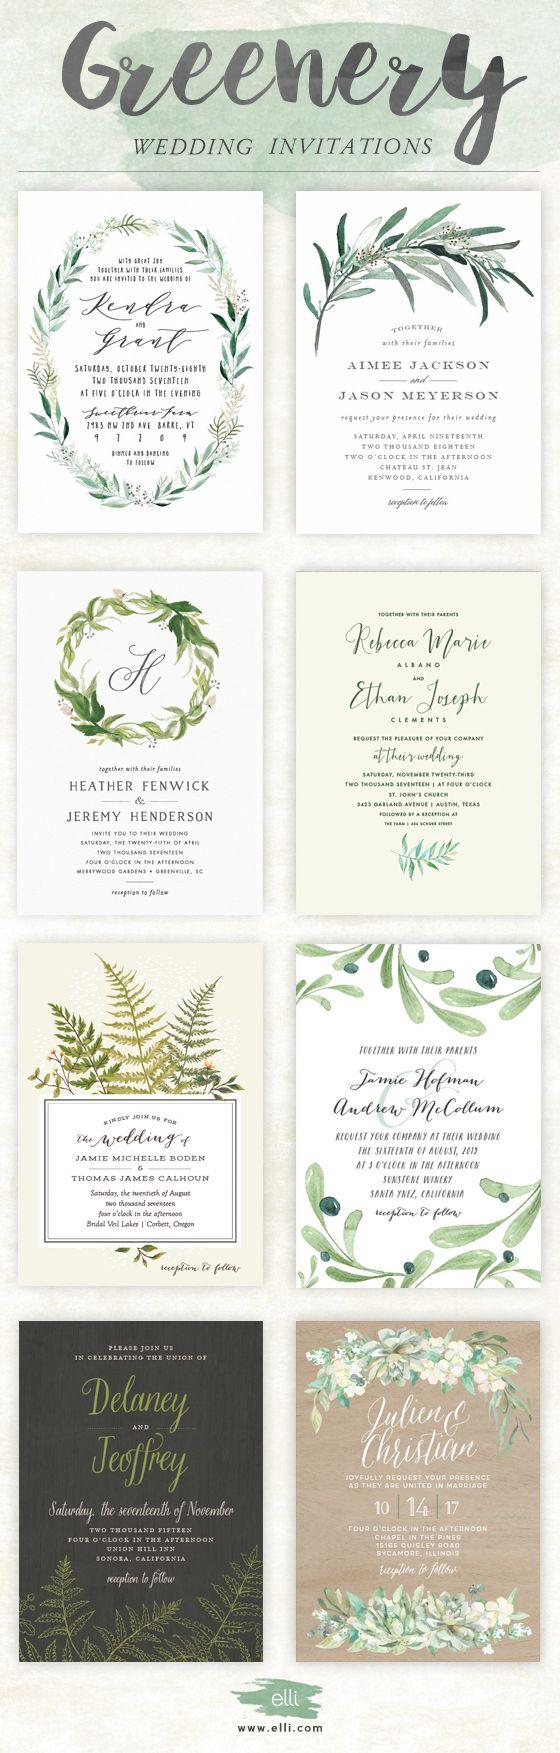 Best 25 invitations ideas on pinterest wedding invitations trending for 2017 greenery wedding invitations from elli stopboris Image collections